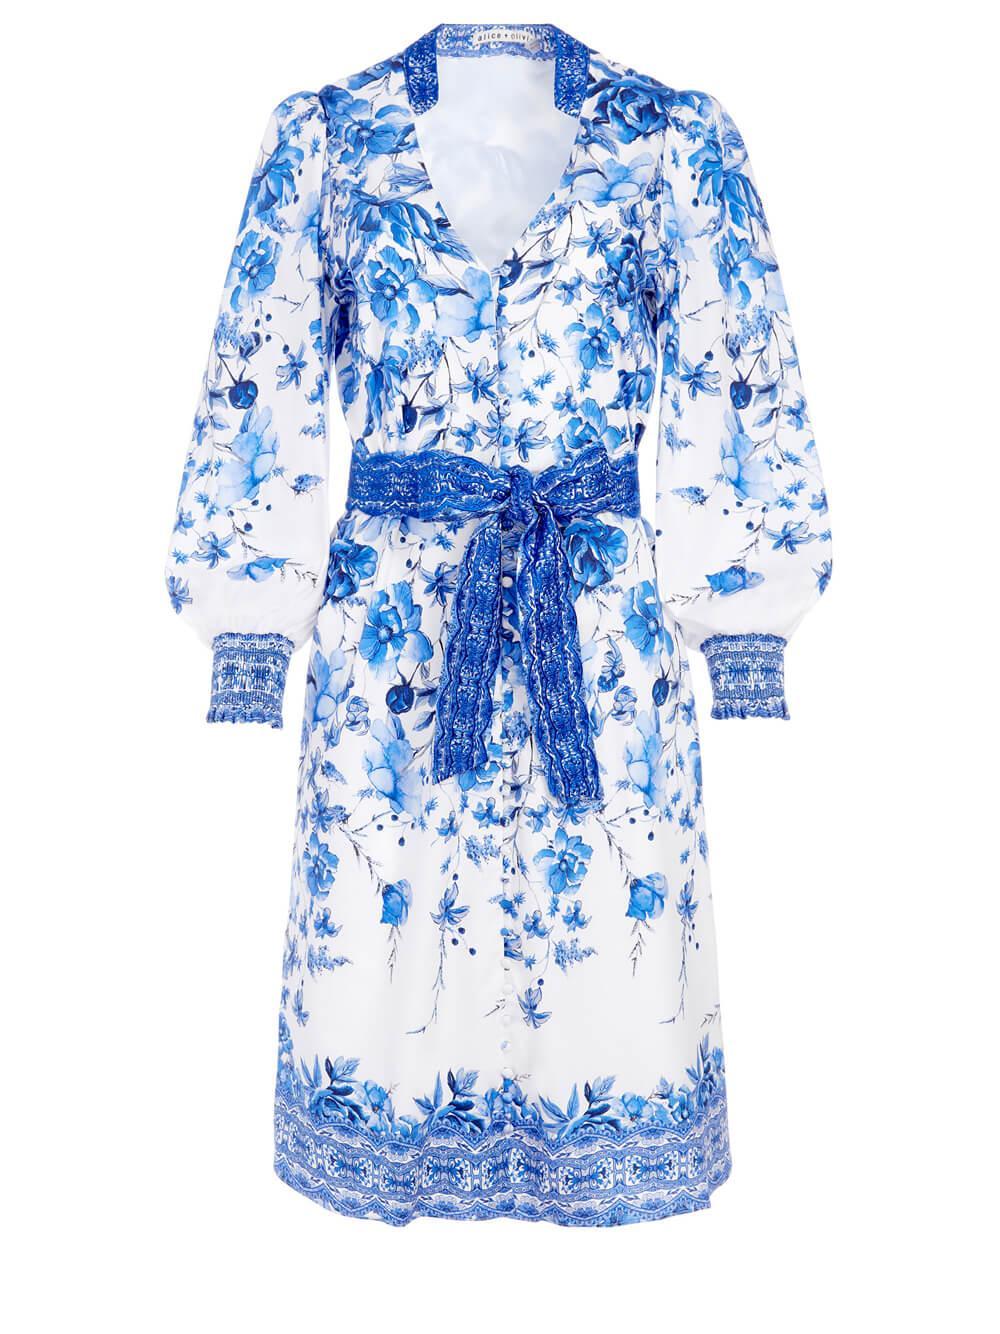 Shanley Dress